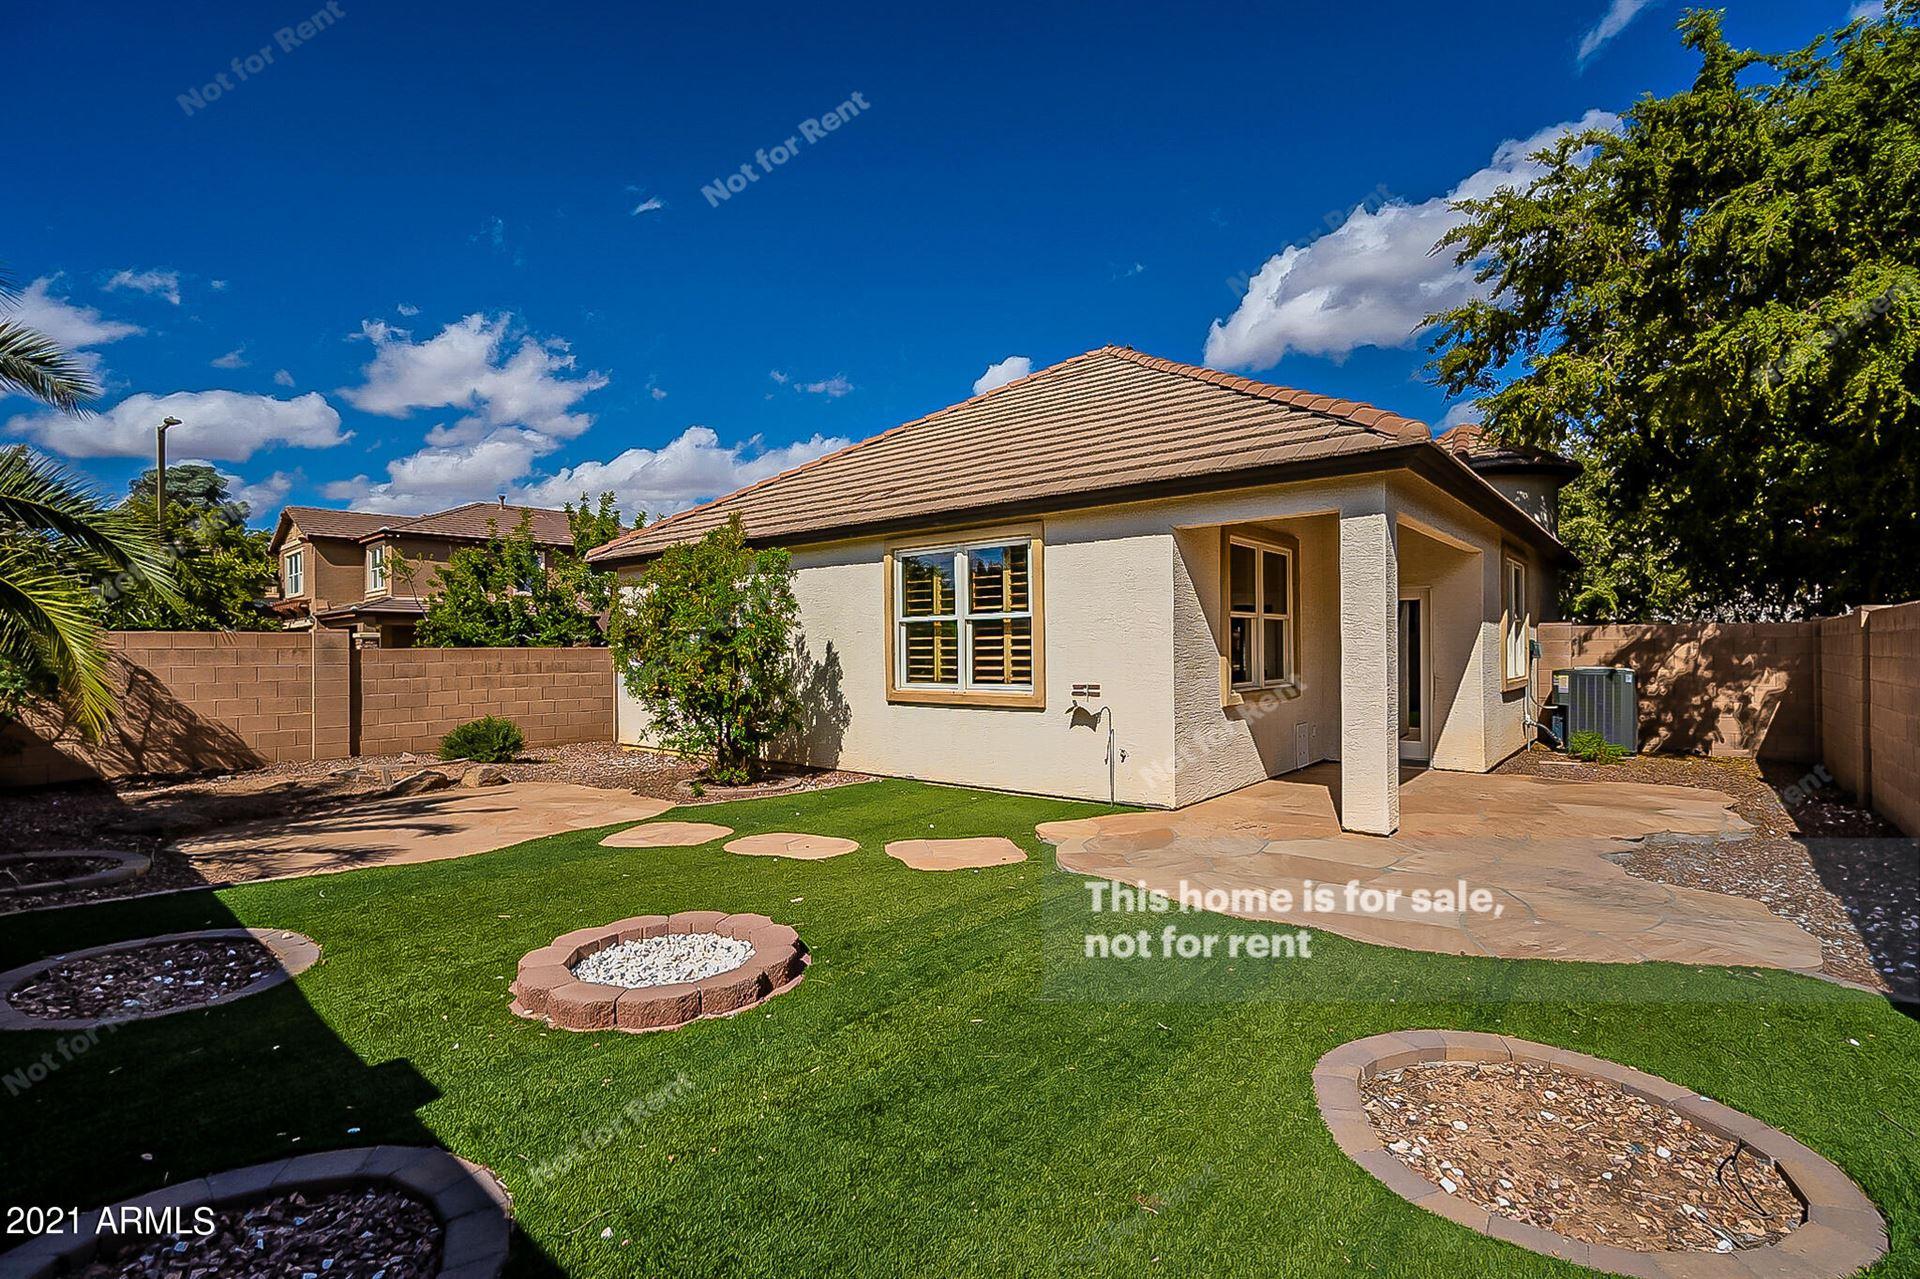 Photo of 17257 W IRONWOOD Street, Surprise, AZ 85388 (MLS # 6311260)